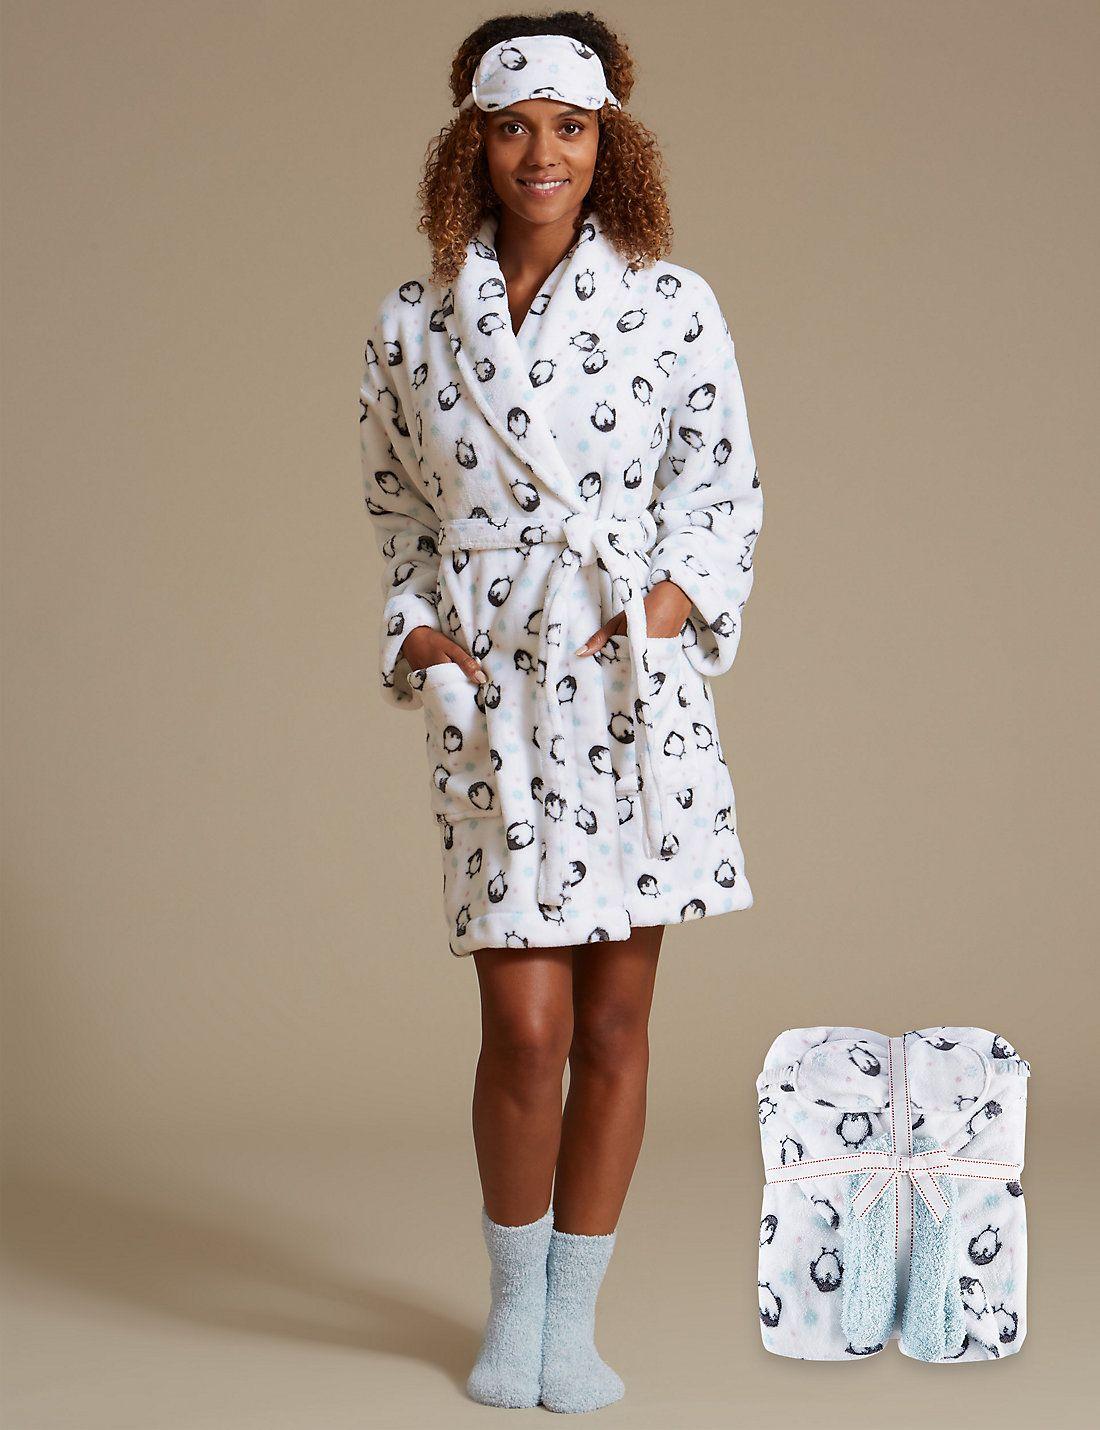 Long Sleeve Dressing Gown Set   AW LADIES NIGHTWEAR   Pinterest ...